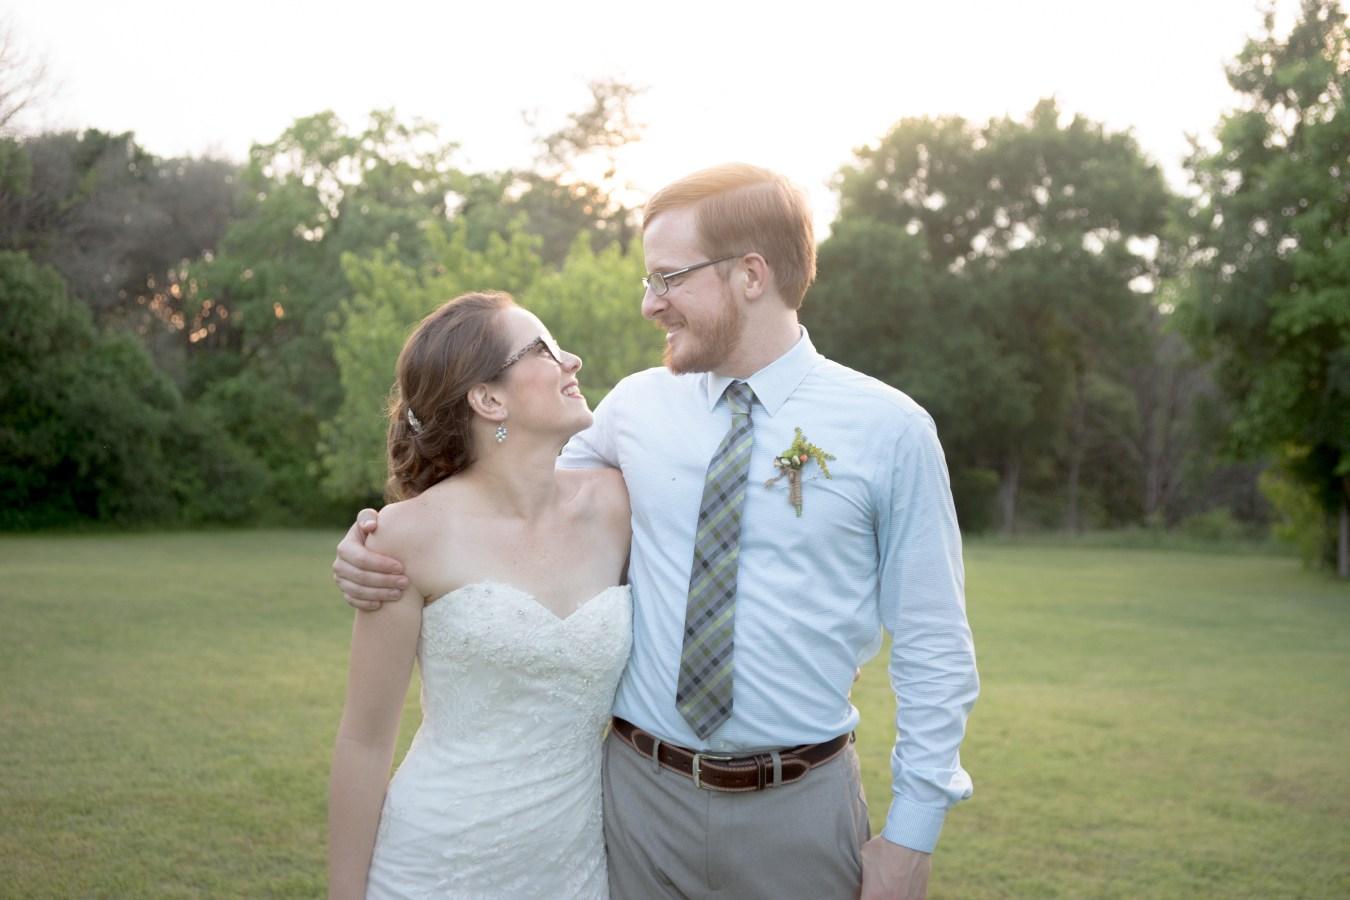 HighDot-Studios-Wedding-Cedar-Bend-Event-Center -Austin-Kim and Mike (59)